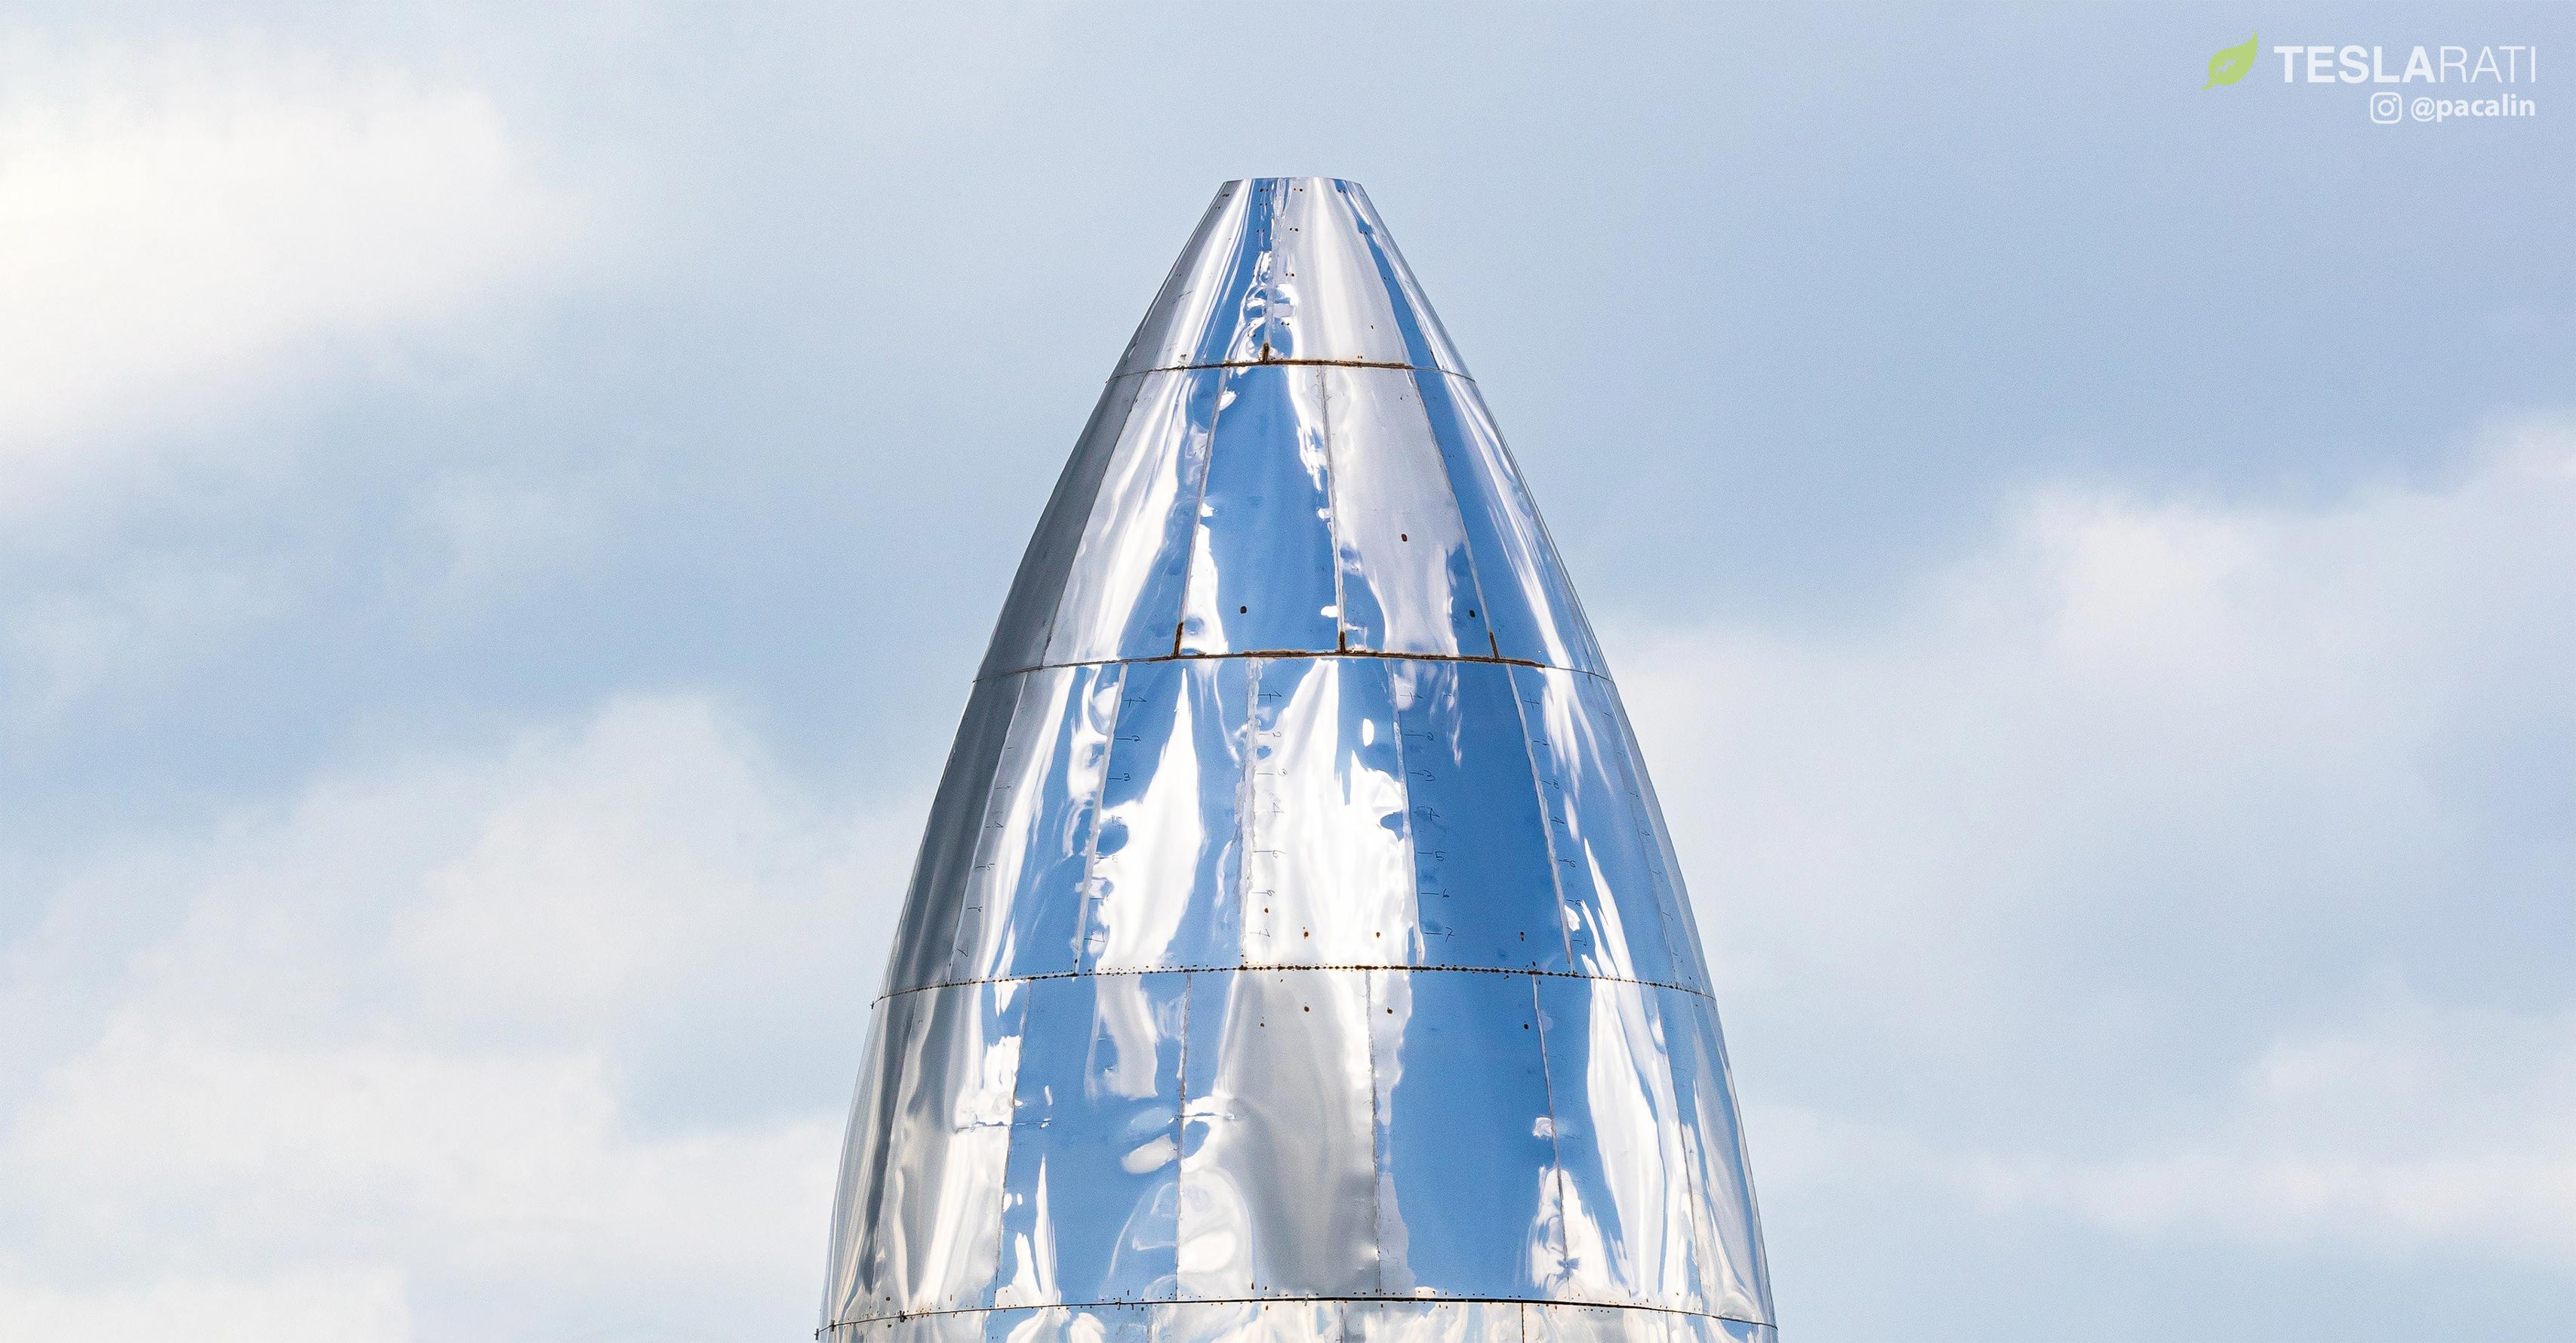 orbital Starship prototype Florida 062419 (Pauline Acalin) 1 crop (c)